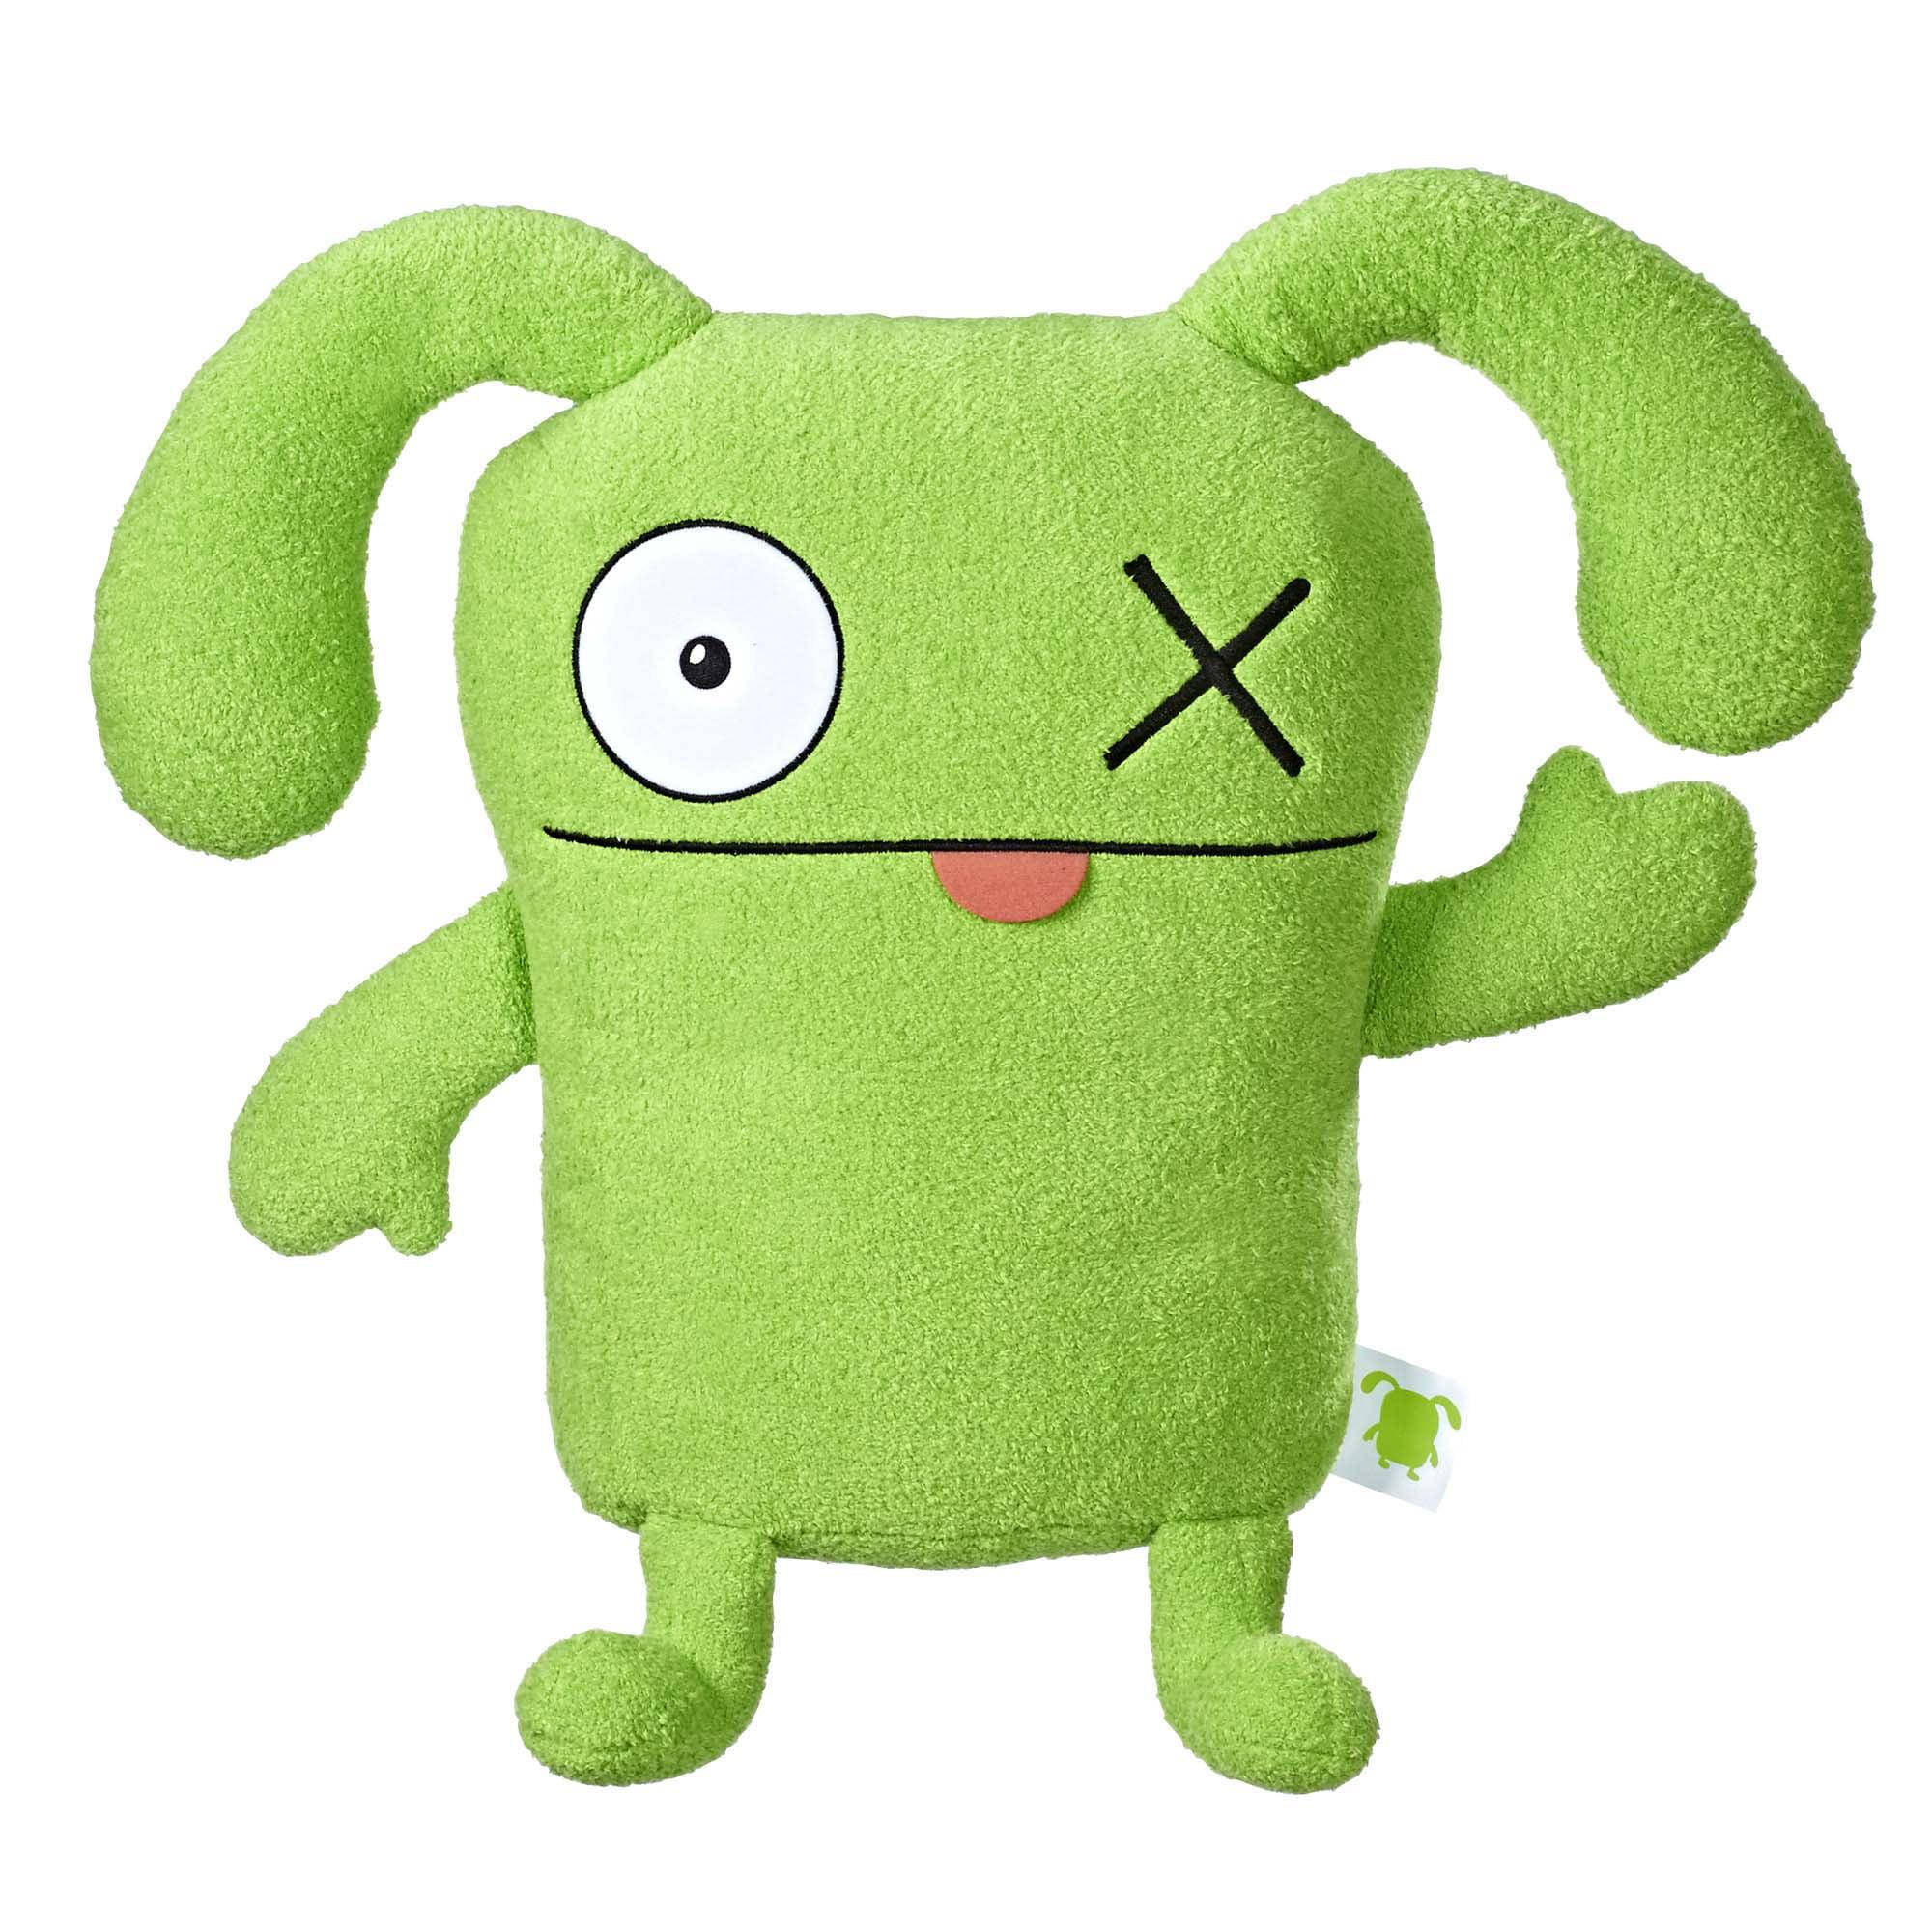 UglyDolls OX Large Plush Stuffed Toy, 18.5 inches tall